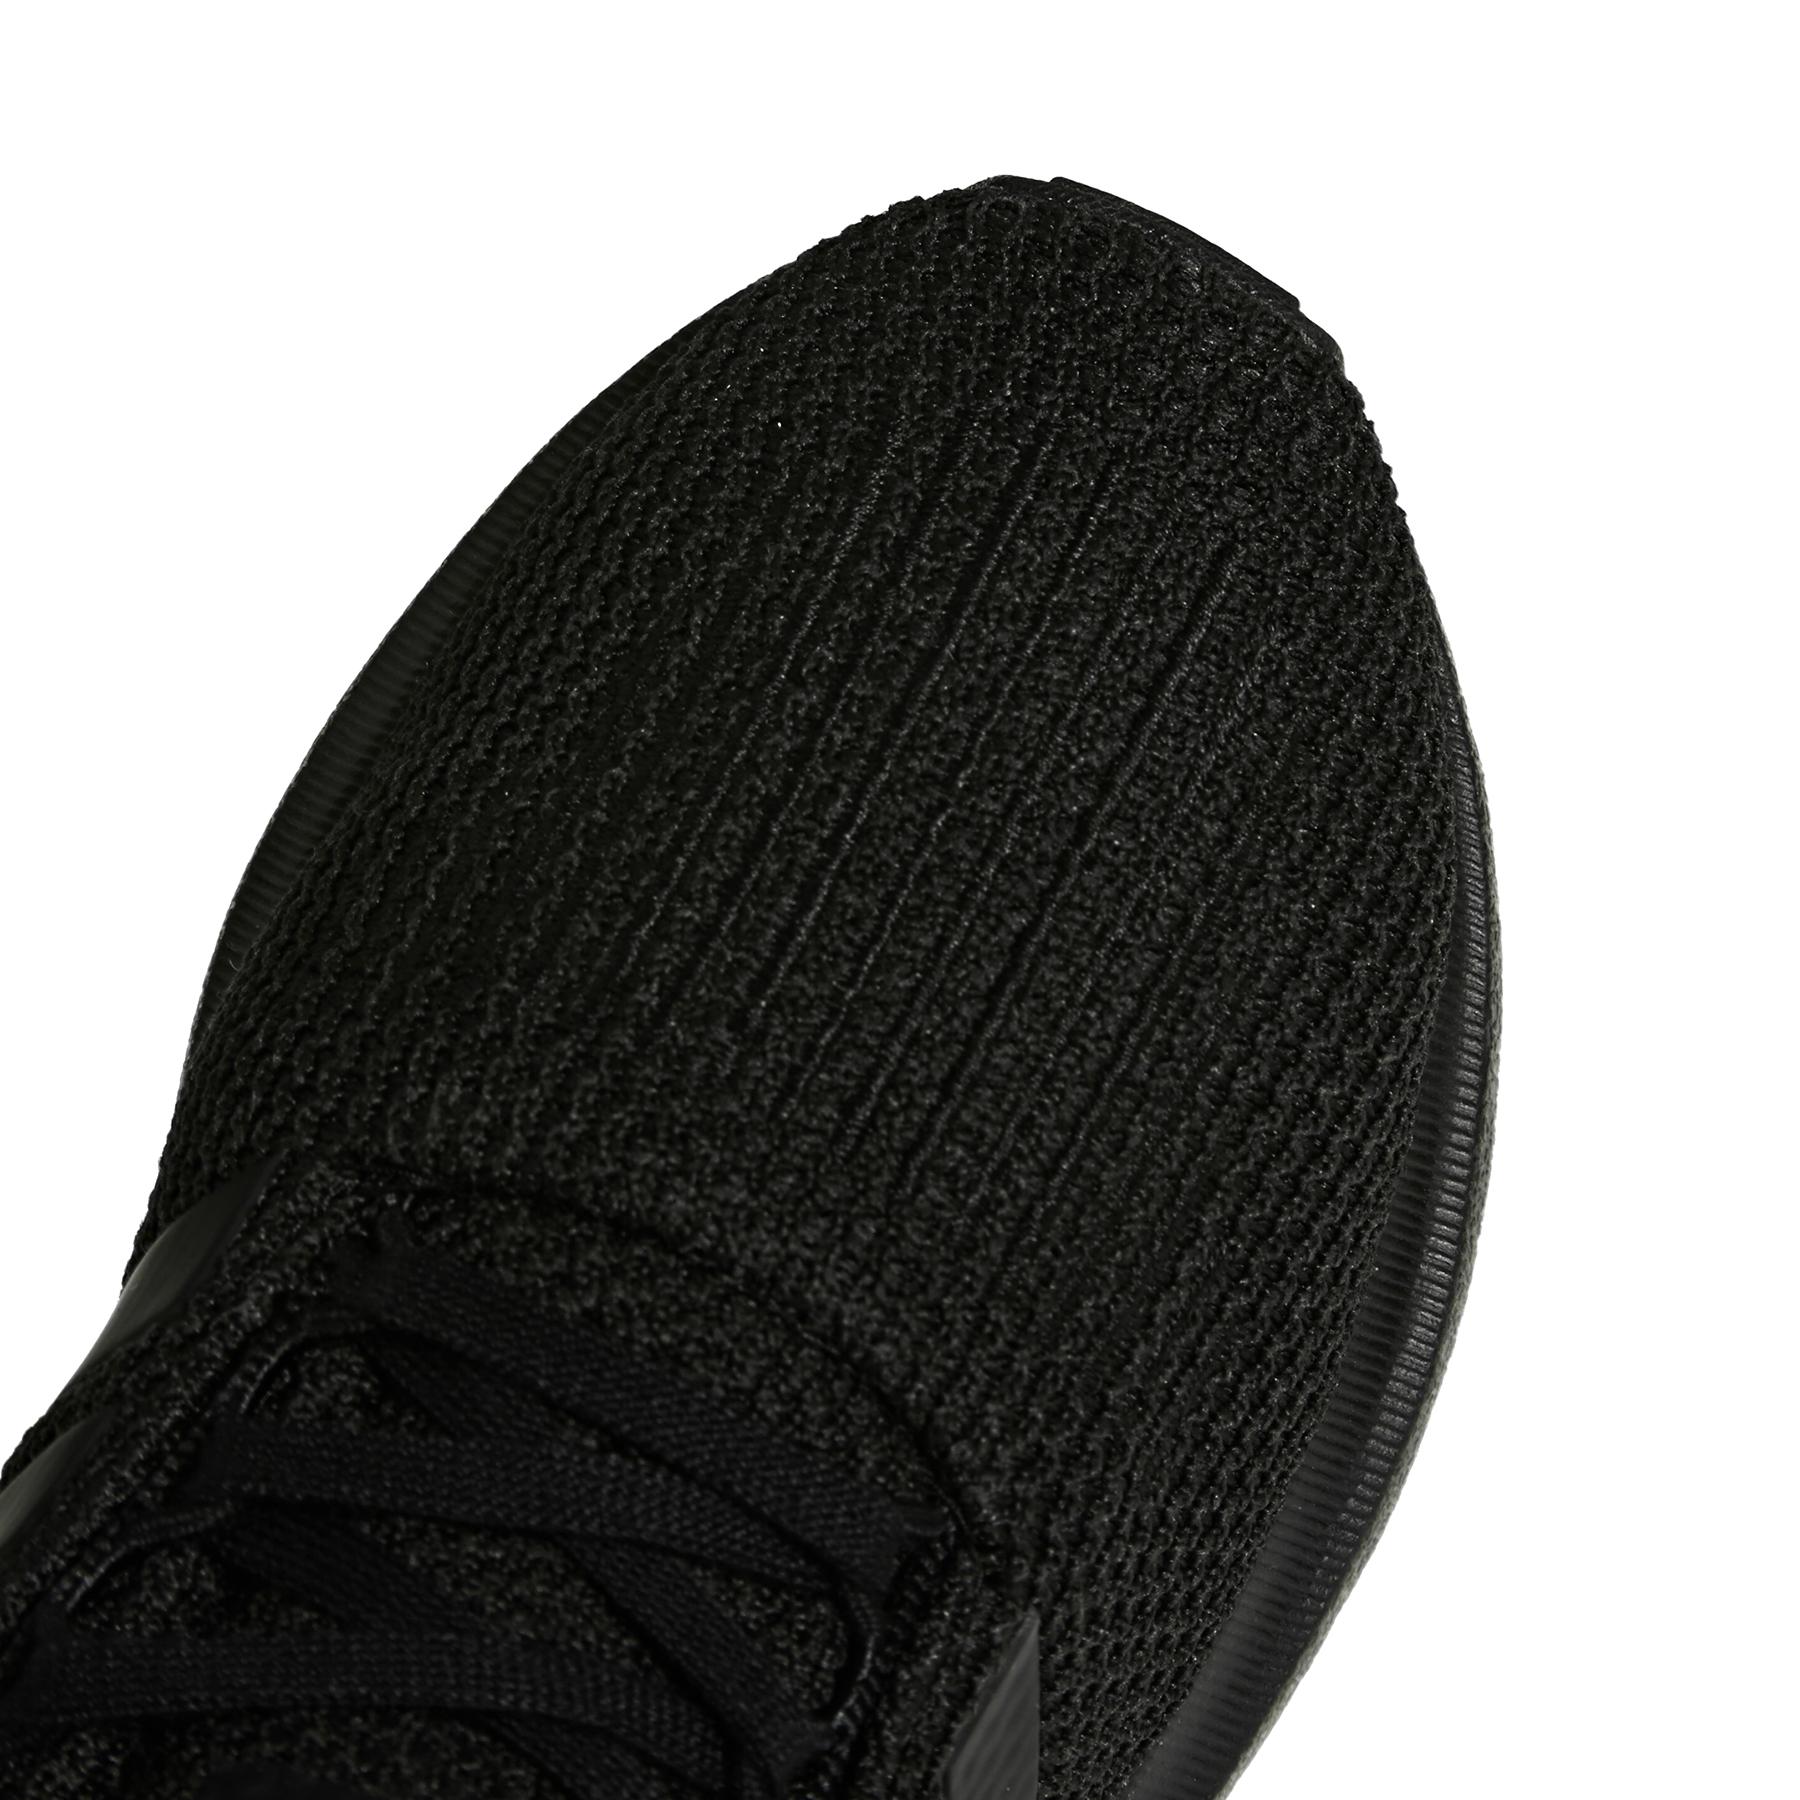 Adidas Swift Run Shoes Men's 7 New NWT